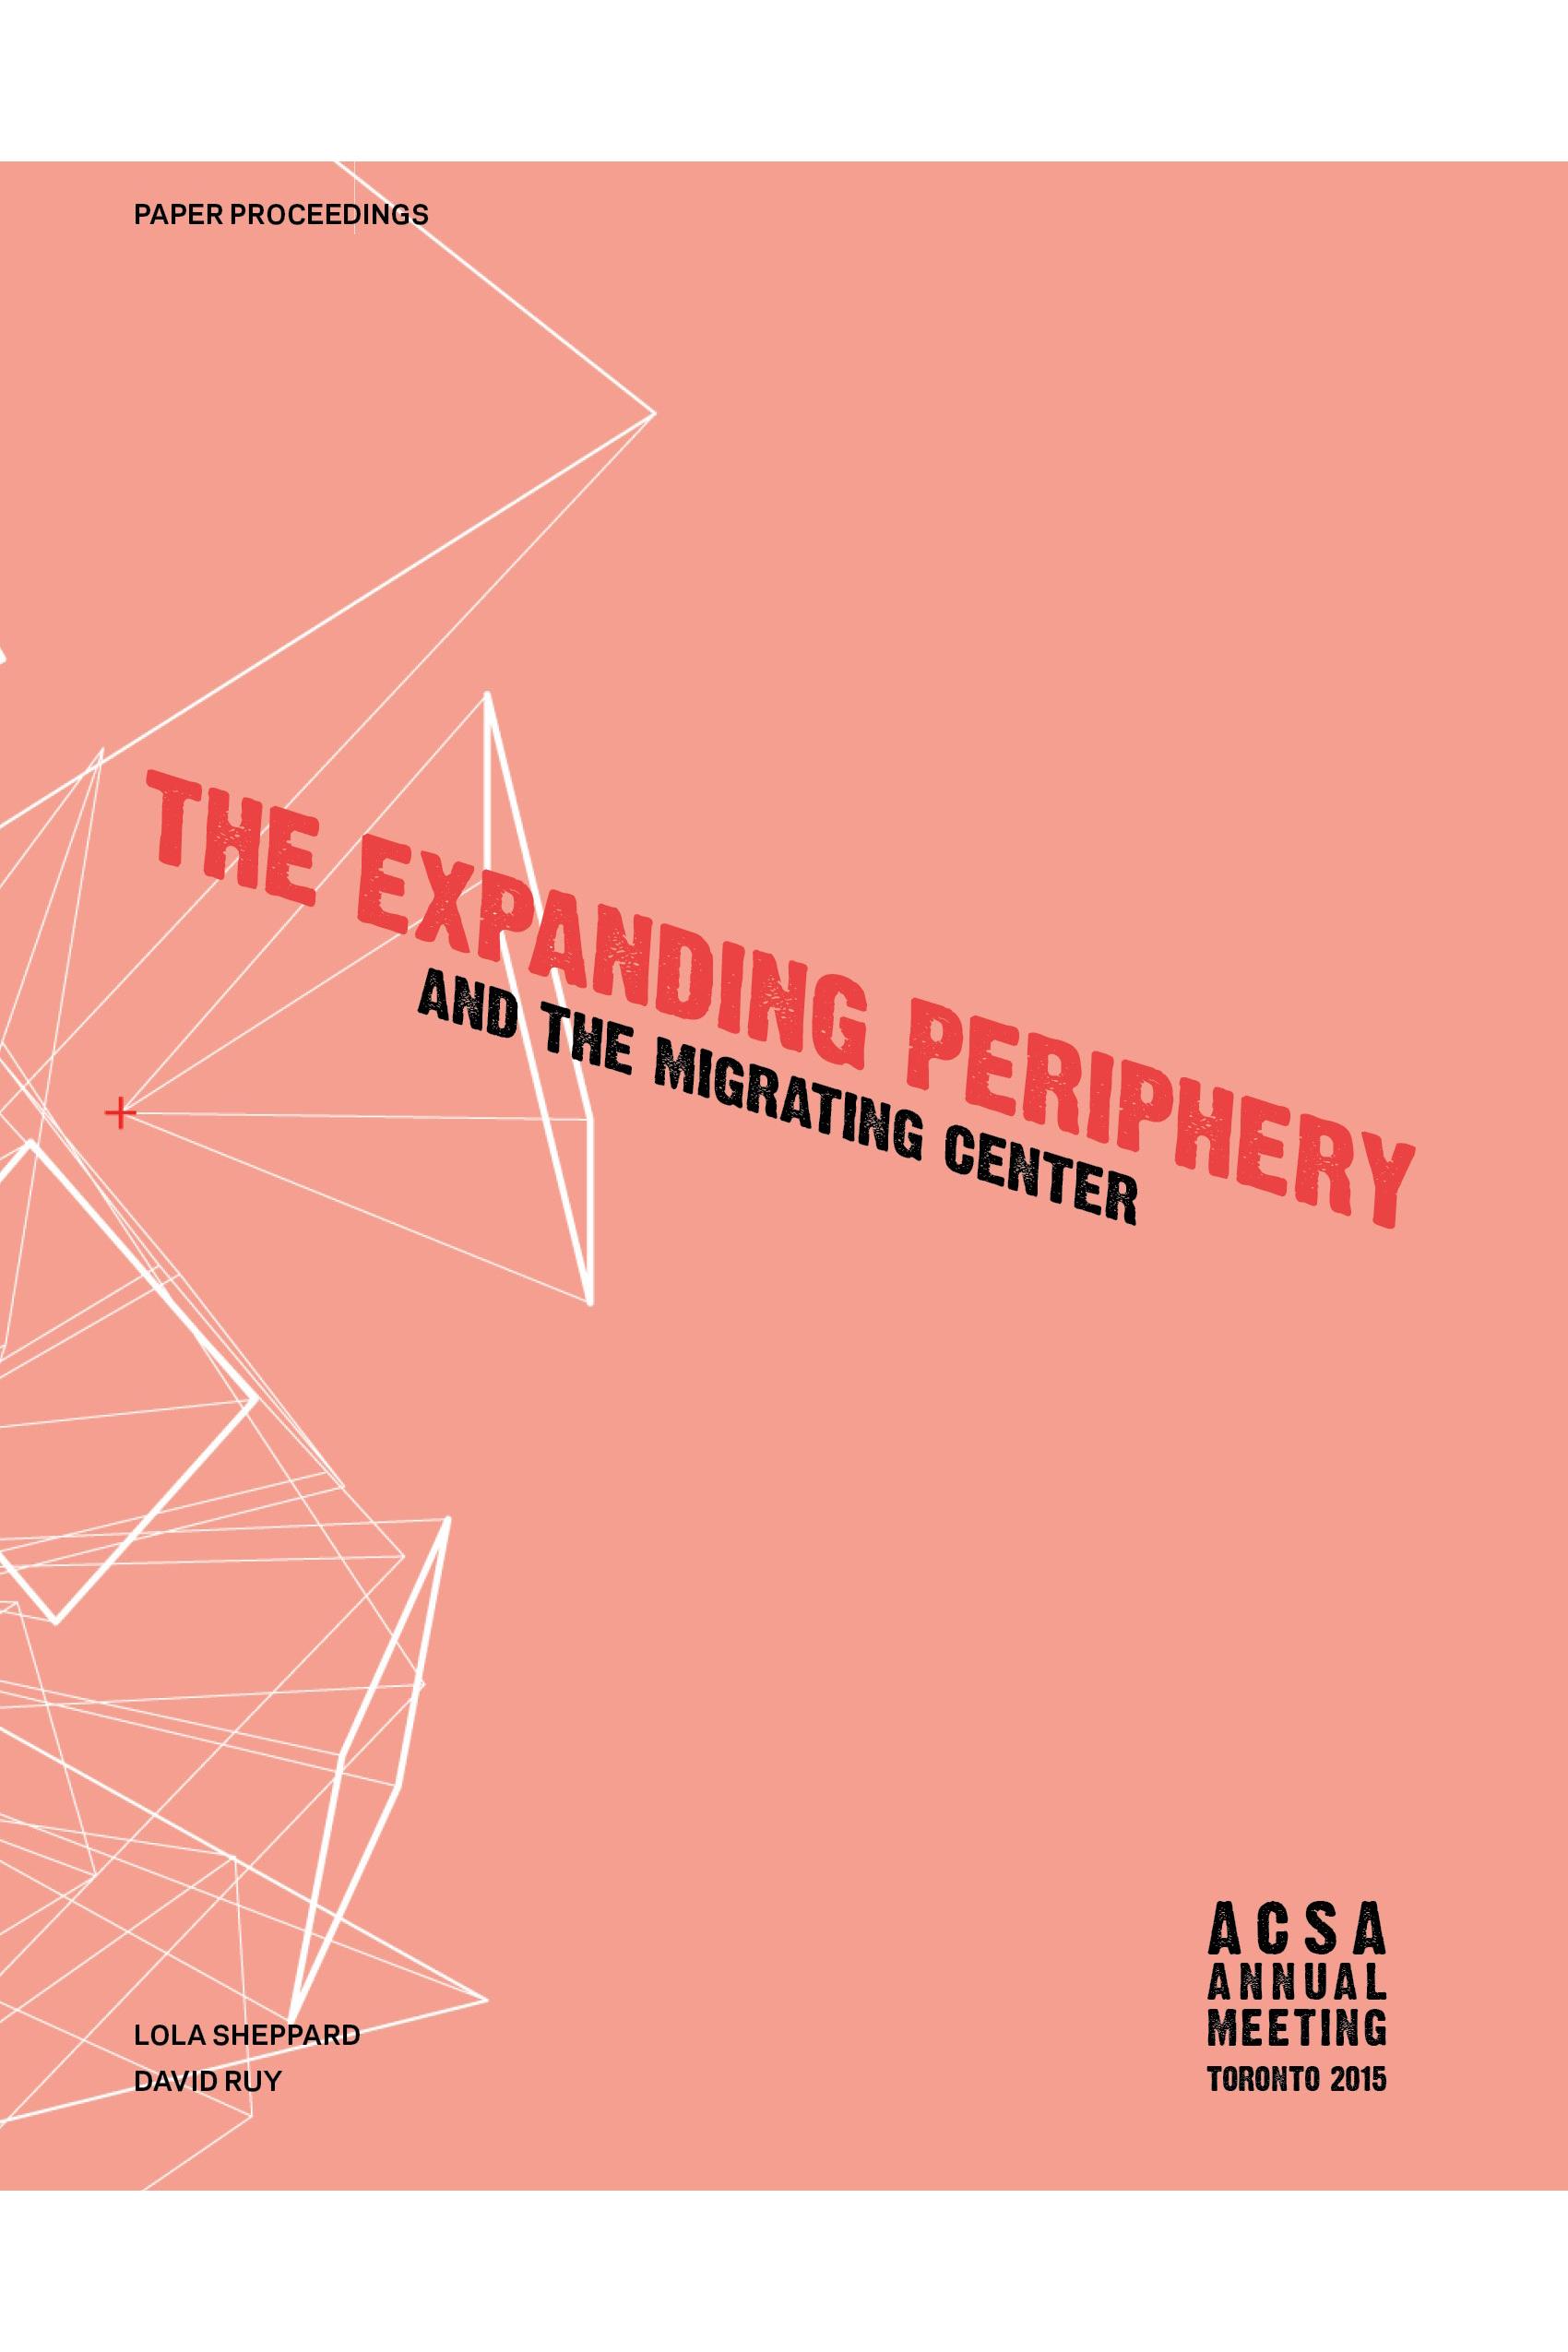 14_ACSA 103-PaperProceedings-Cover PG.png